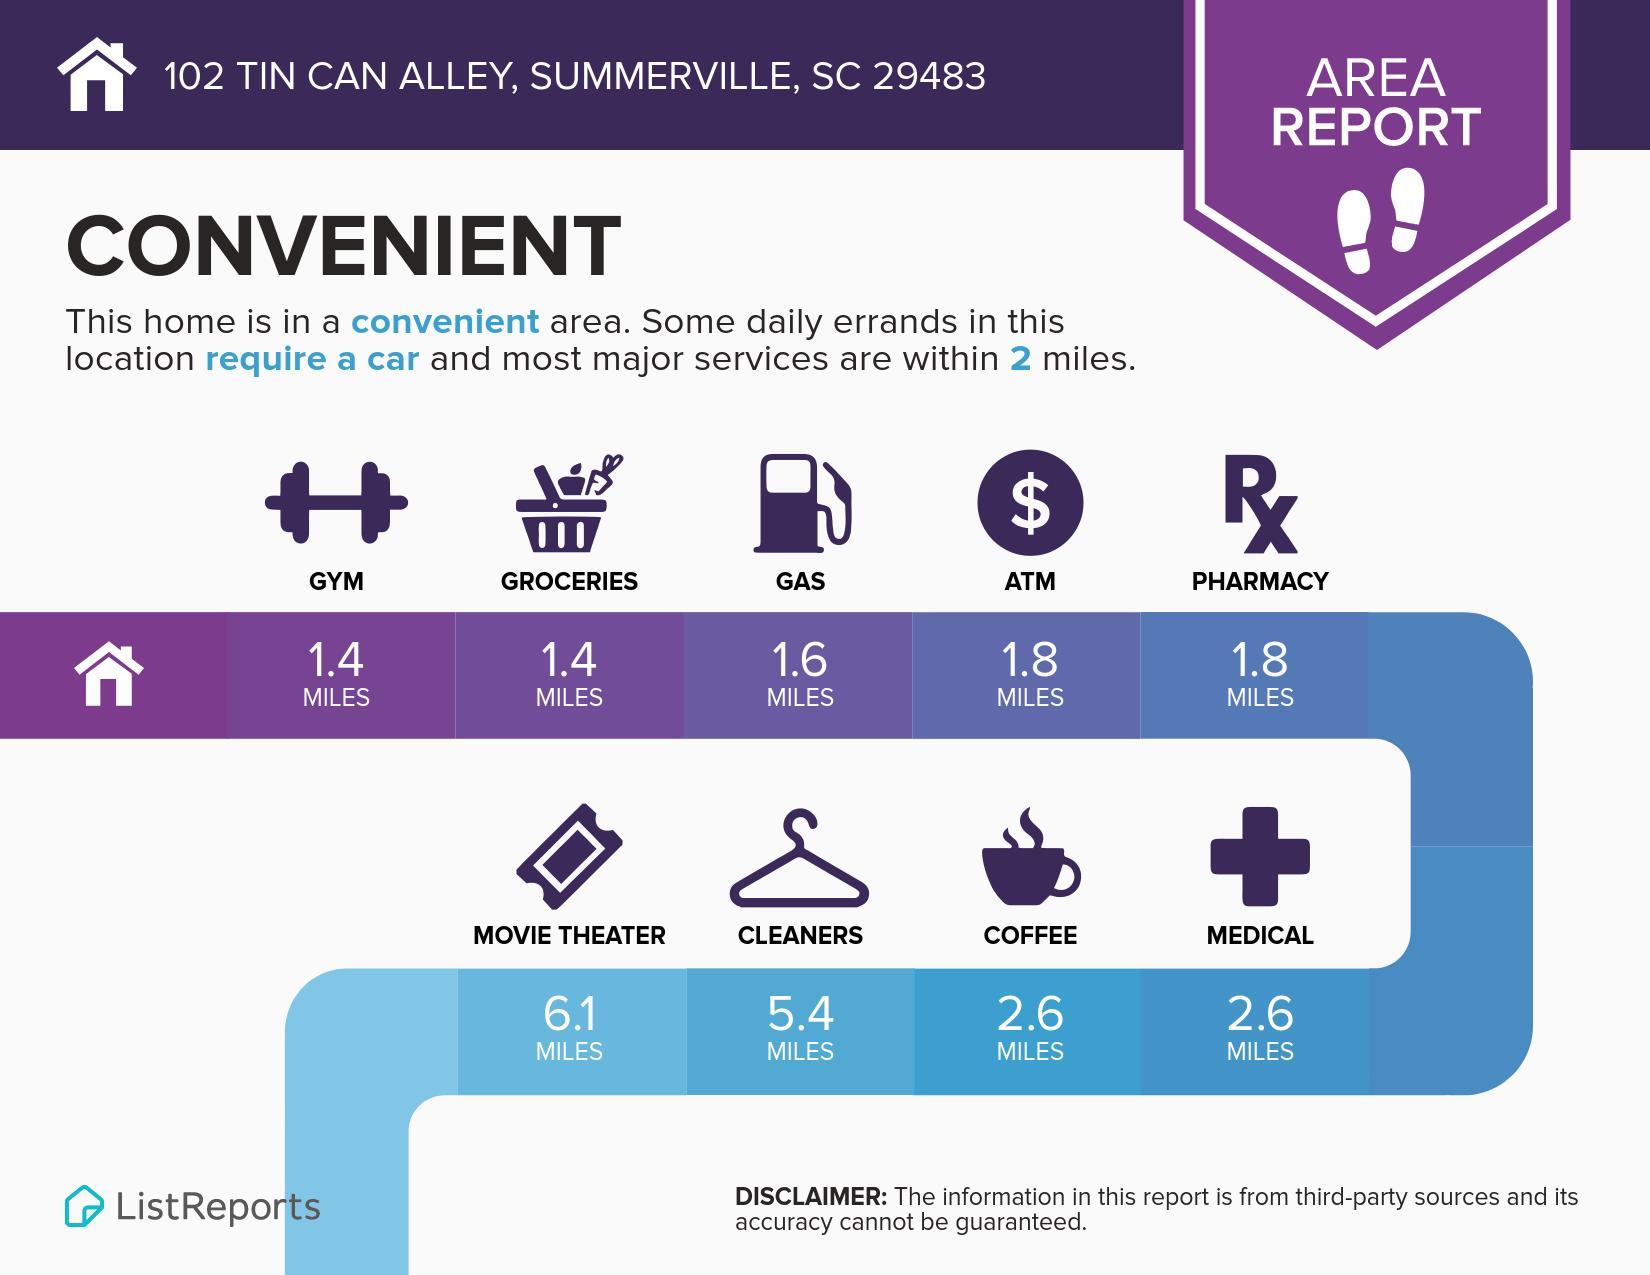 102 Tin Can Alley Summerville, SC 29483